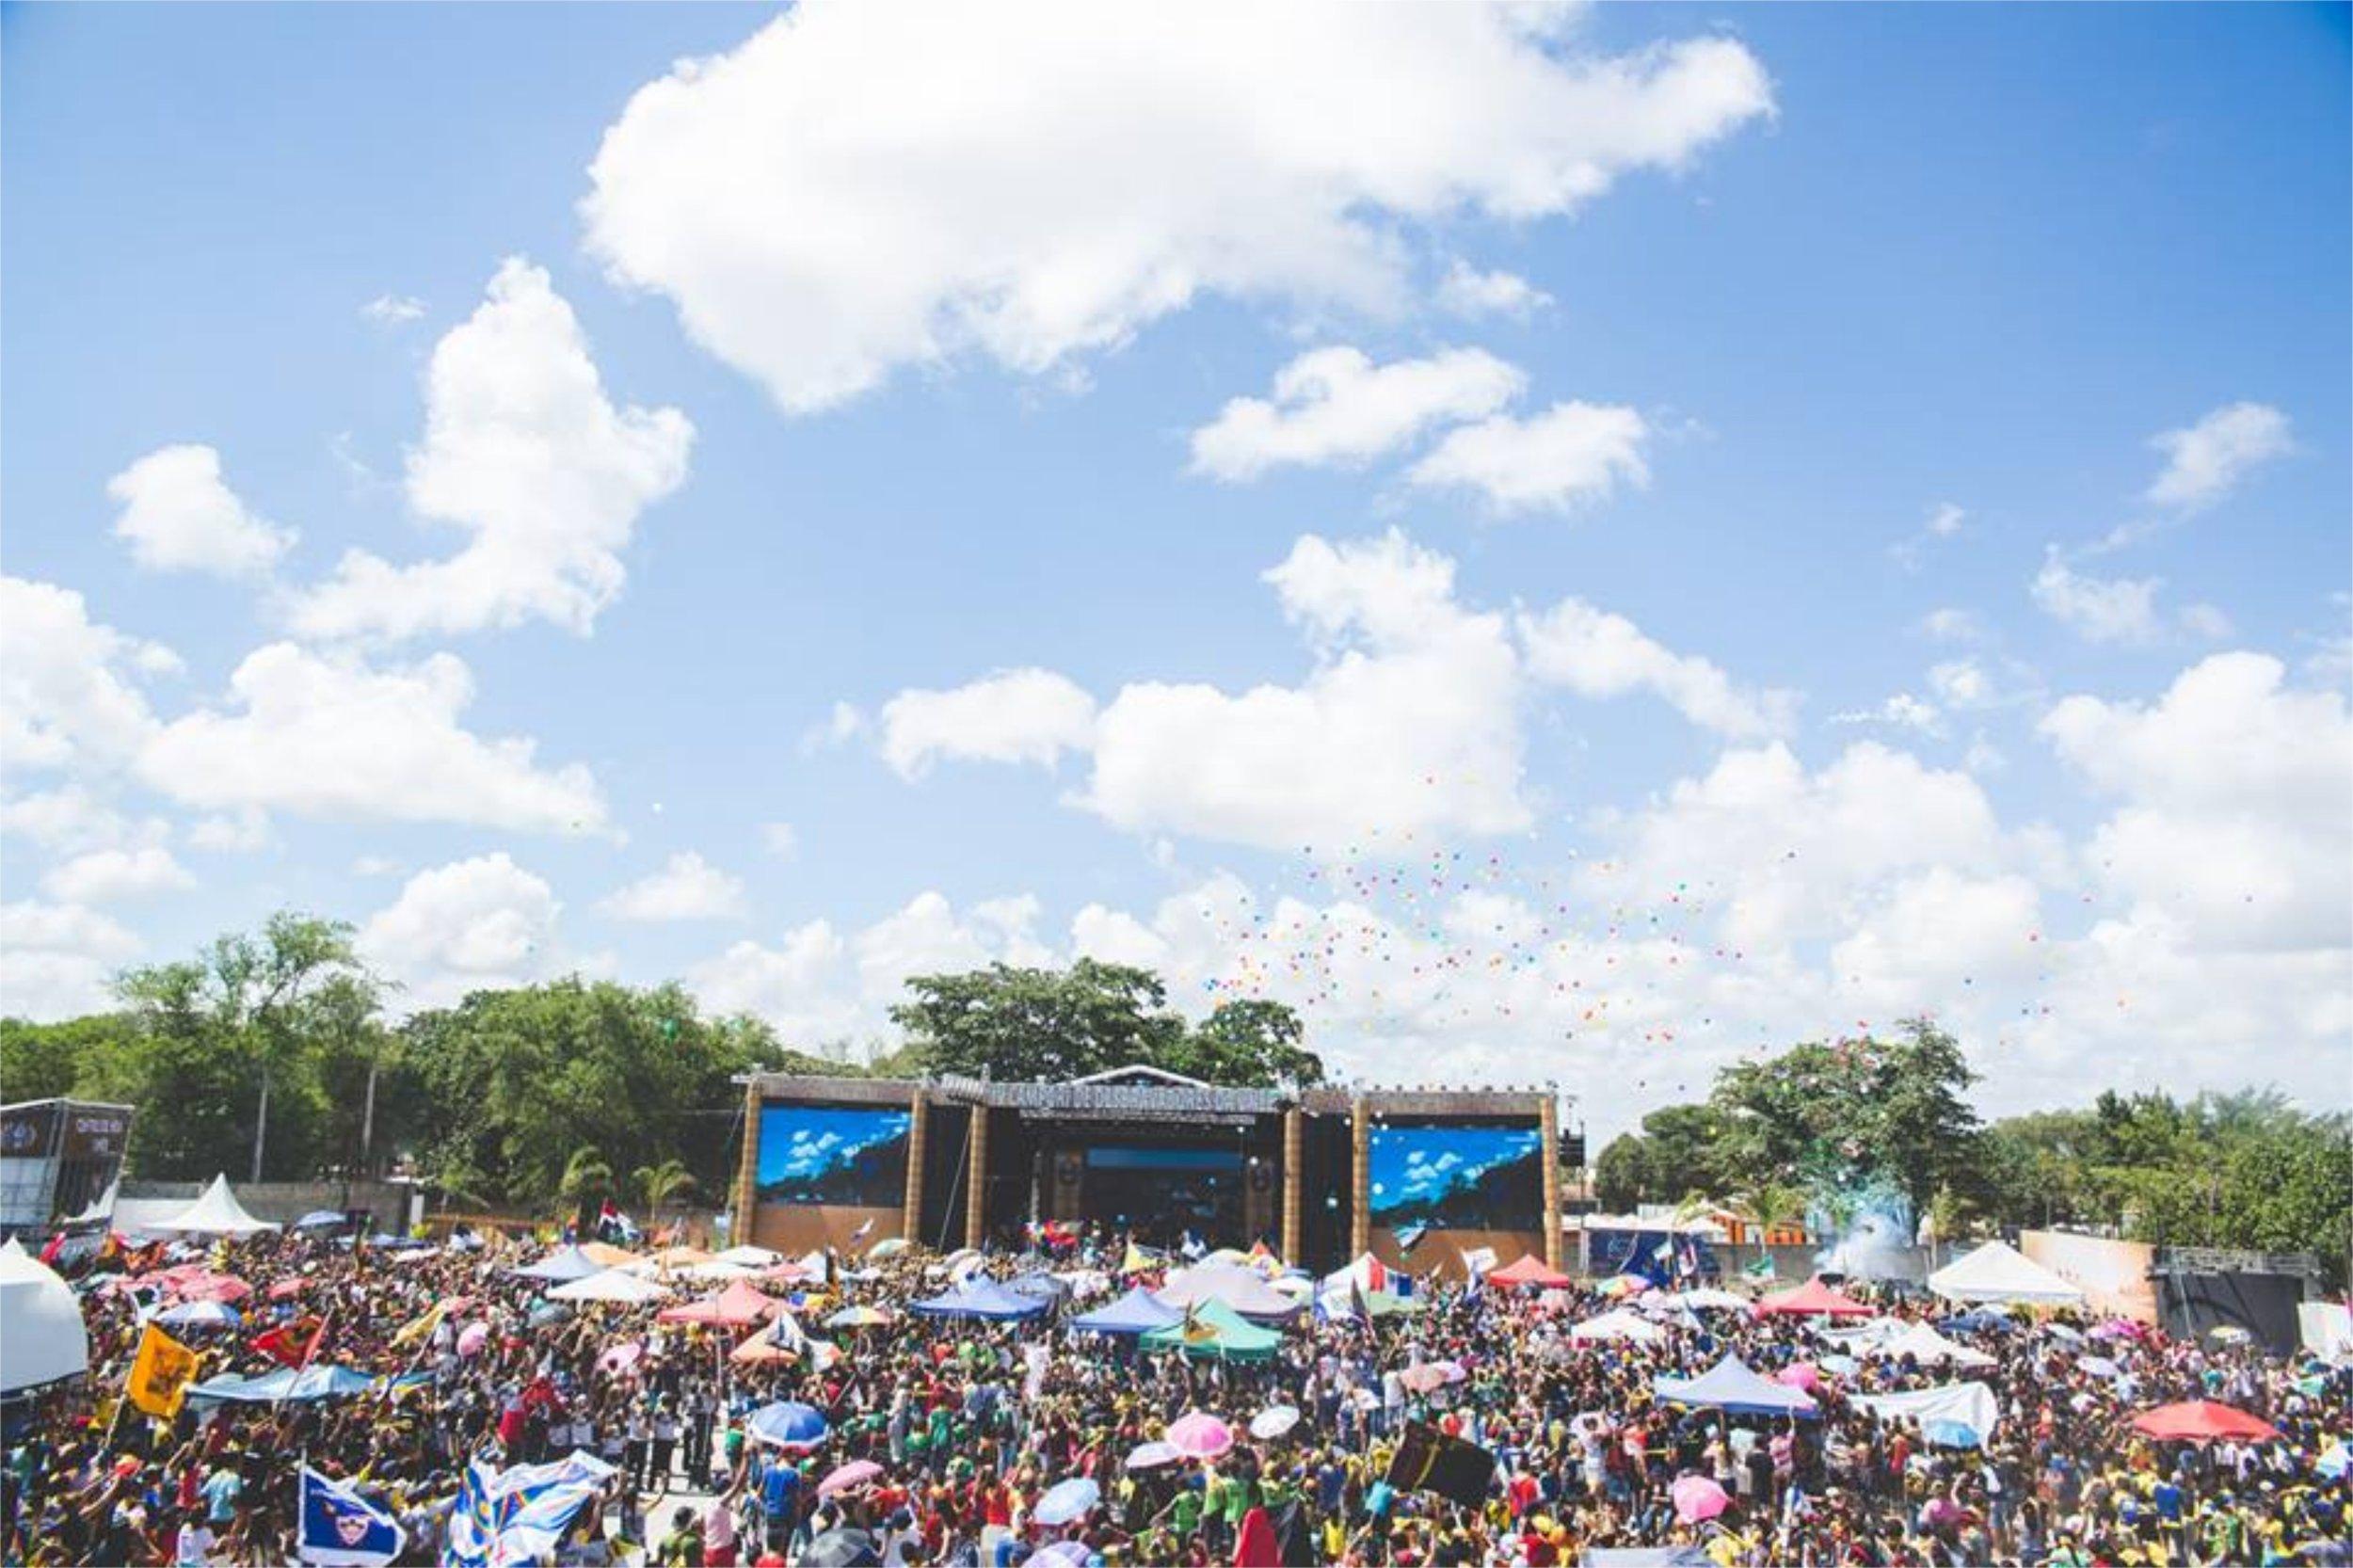 audience-celebration-clouds-920888.jpg